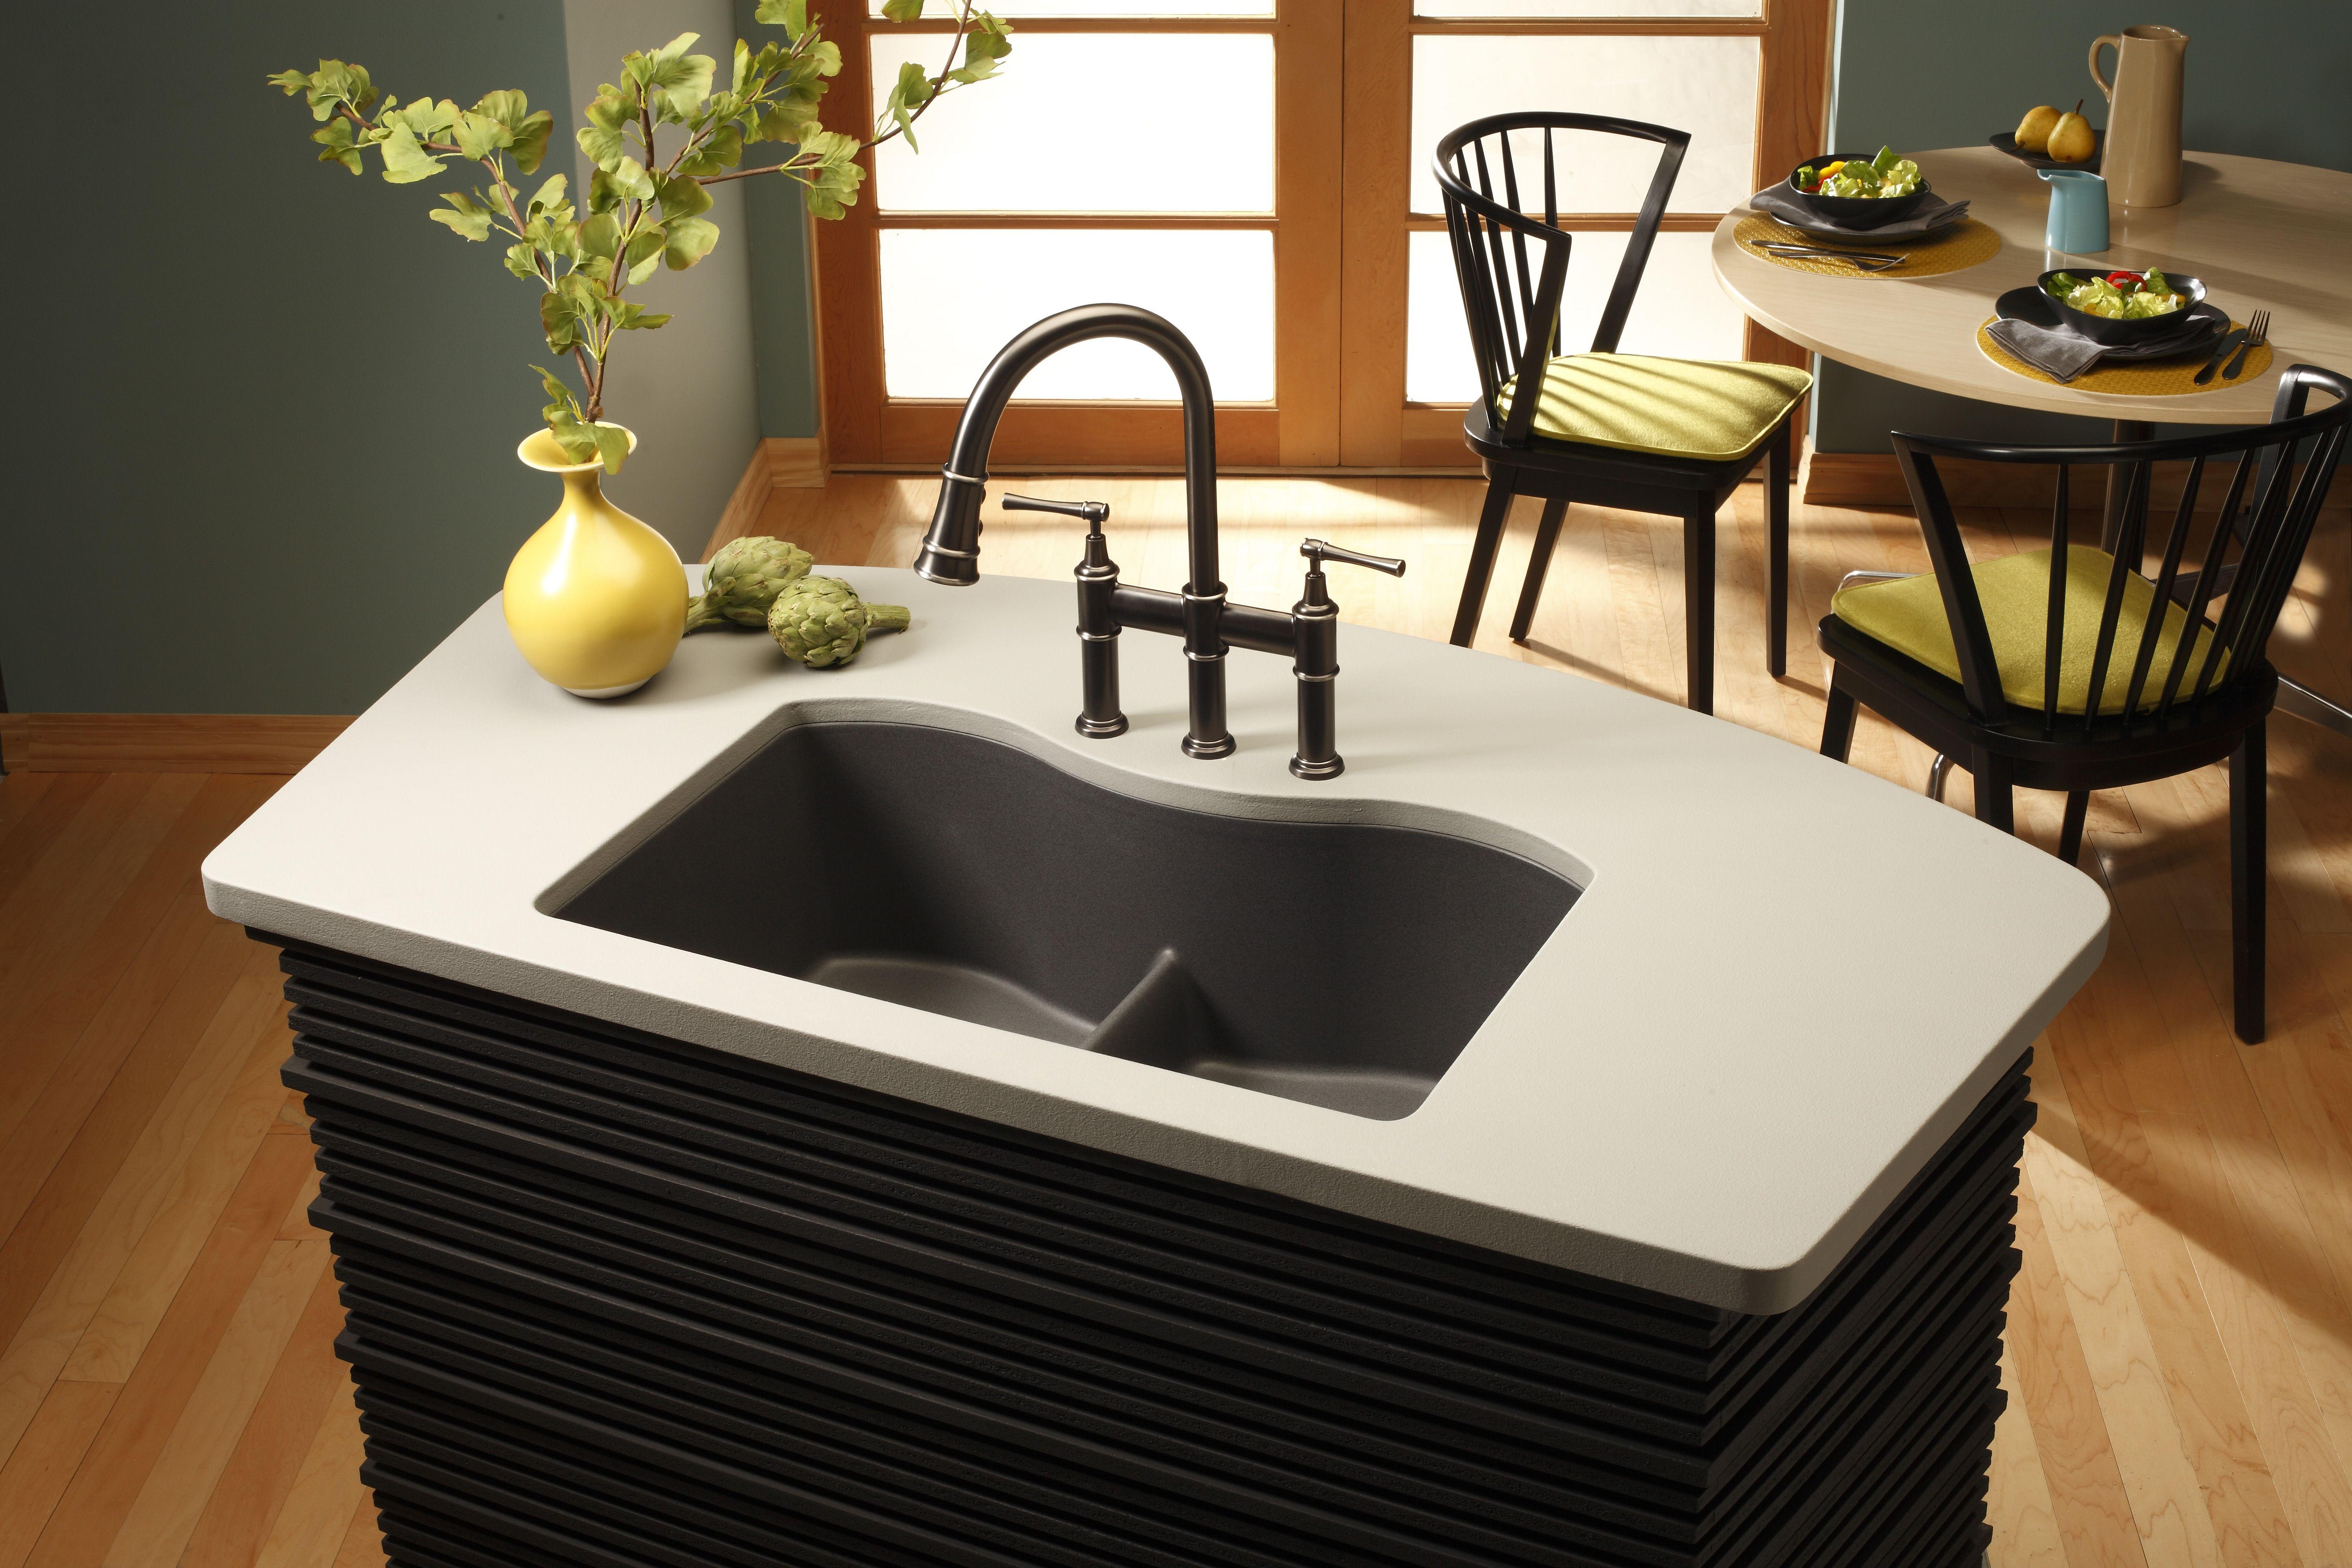 Elegant Elkay Harmony E Granite Double Bowl Undermount Sink ELGULB3322  GerhardsStore.com